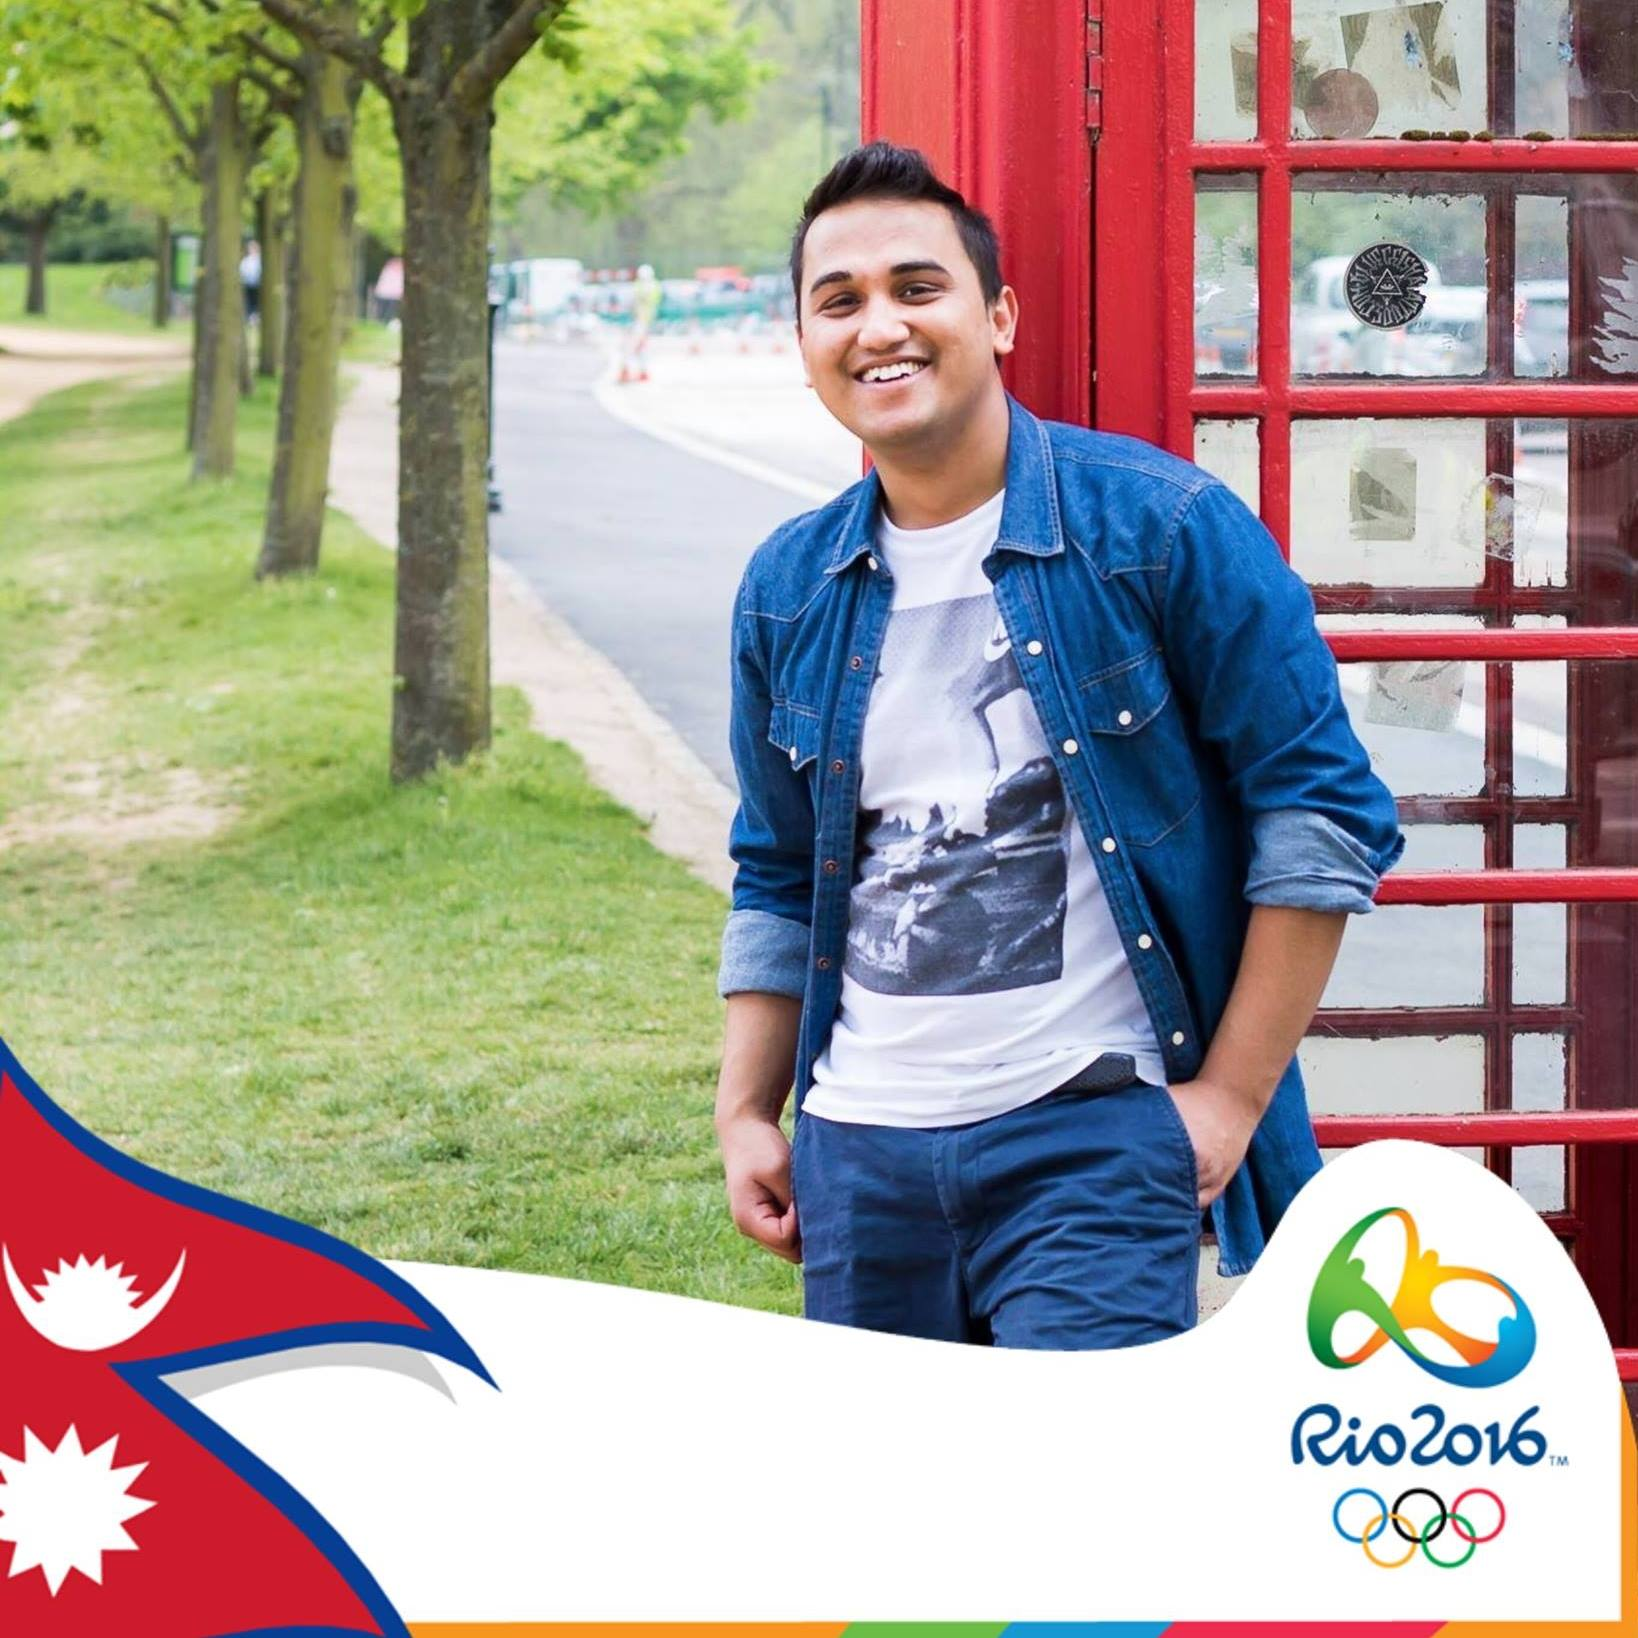 Nepal at Olympics Facebook Profile Pradeep Singh BloggerNepal at Olympics Facebook Profile Pradeep Singh Blogger